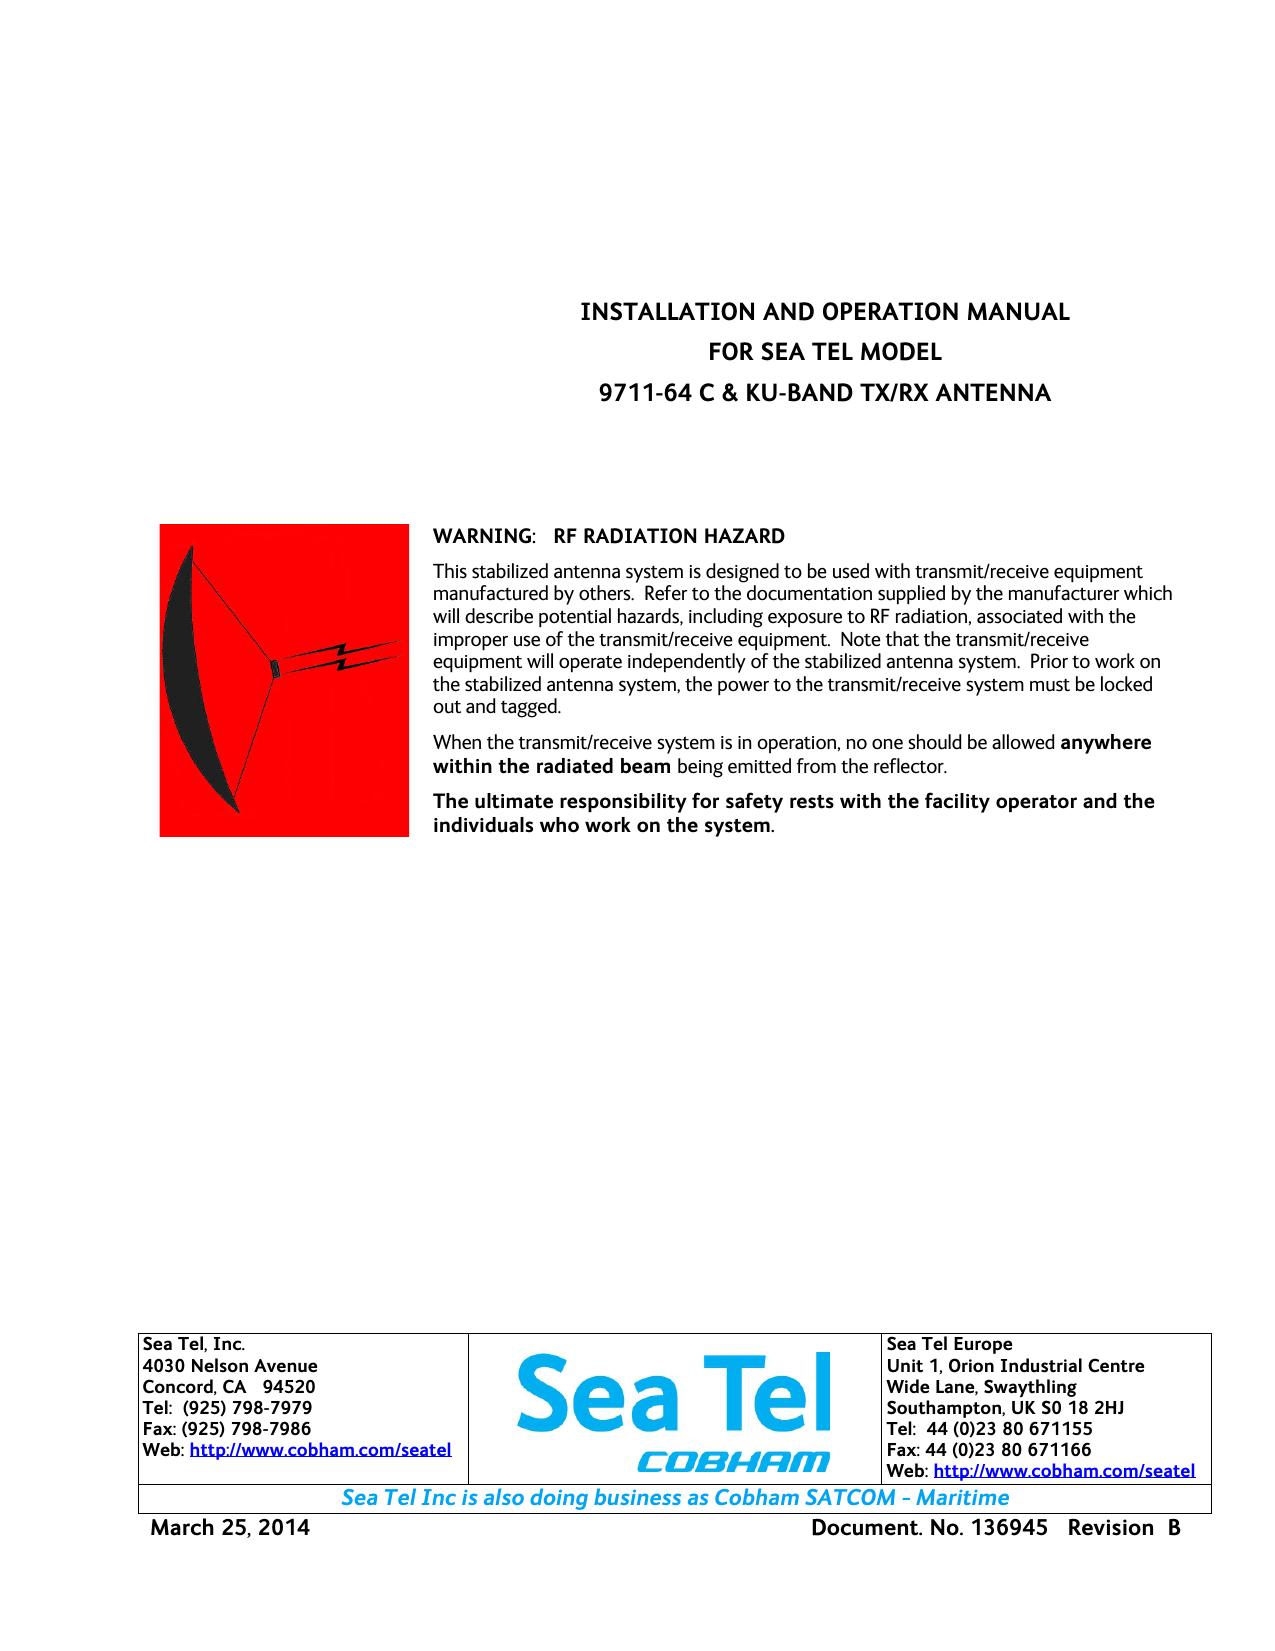 Installation and Operation Manual - Mil-Sat | manualzz com